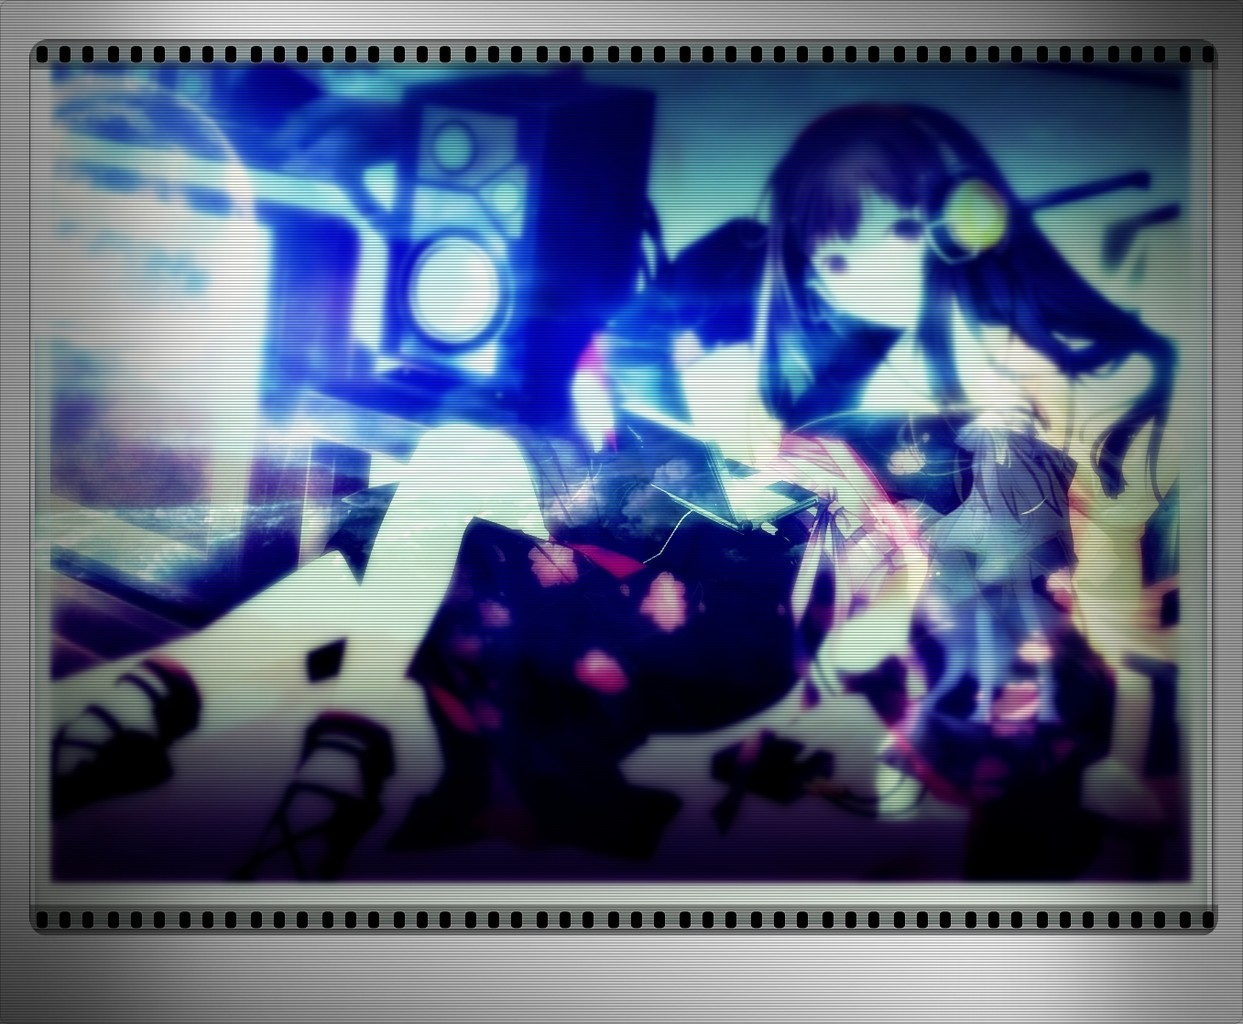 http://livedoor.blogimg.jp/dai70d/imgs/0/2/029498af.jpg